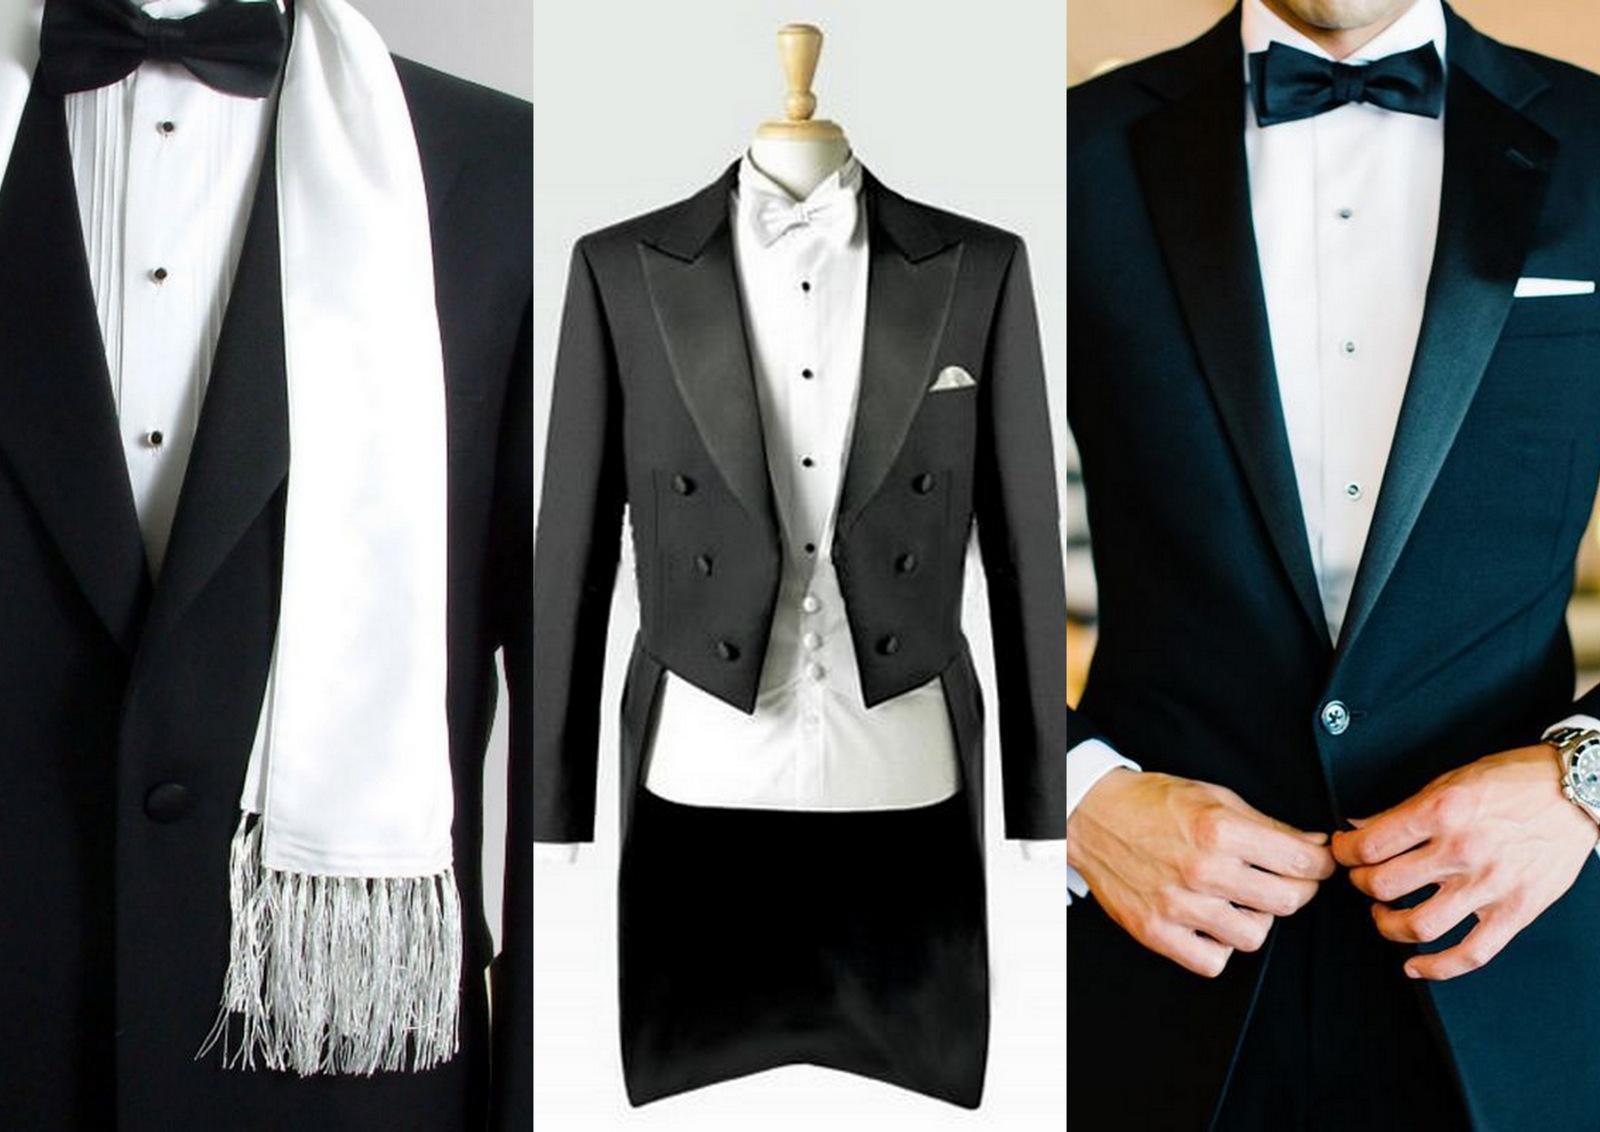 plesová sezóna  3  správny výber obleku podľa dress codu    pánska móda a792146d973